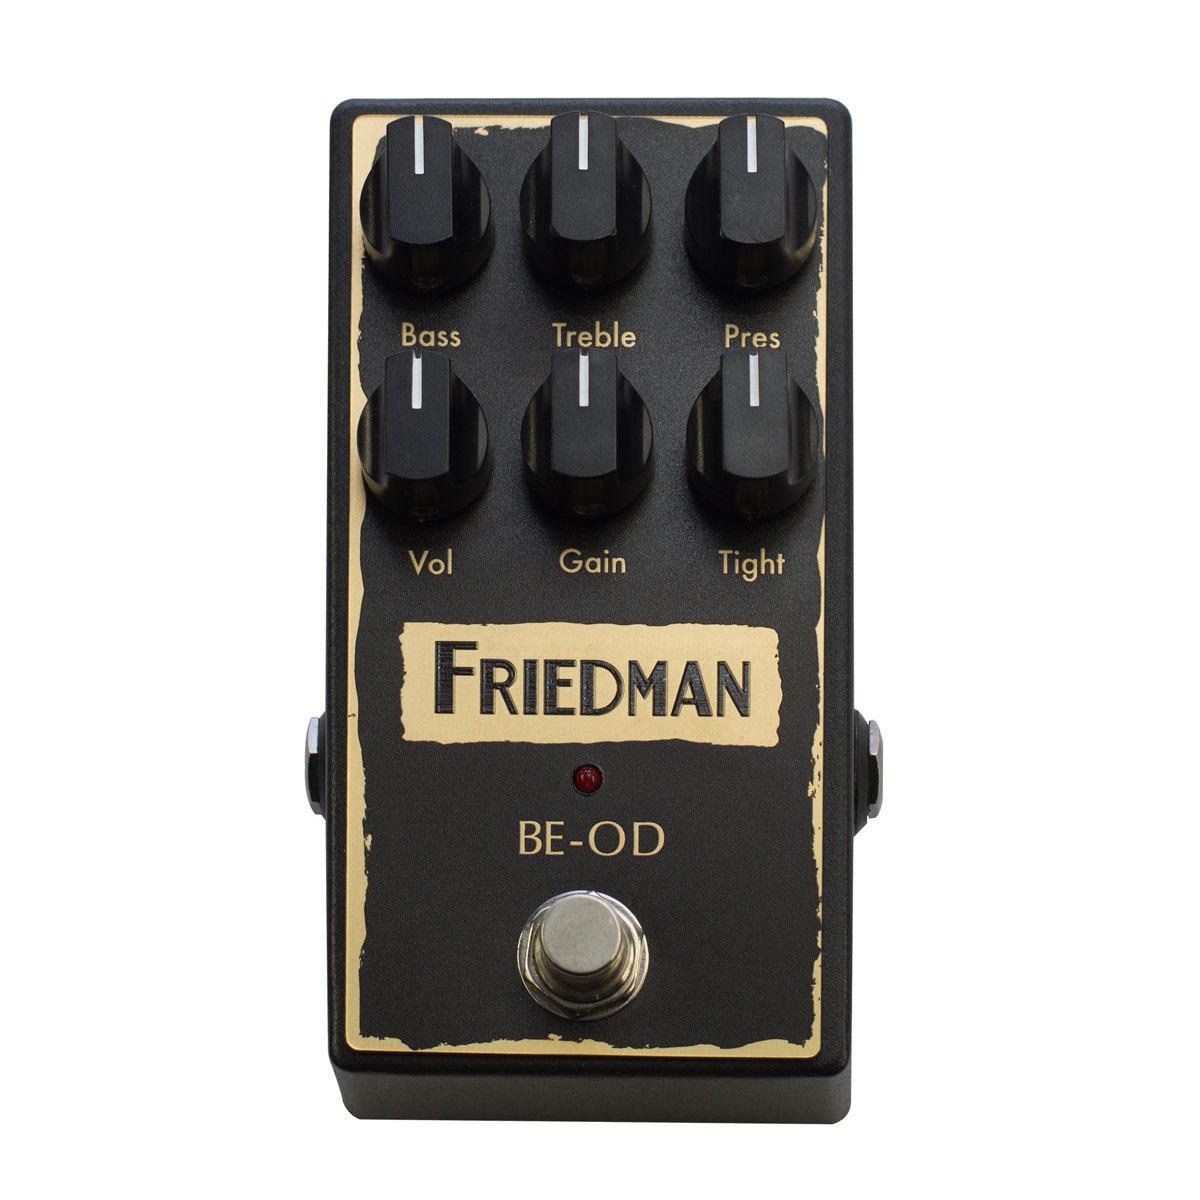 Friedman BE-OD [Yokohama]